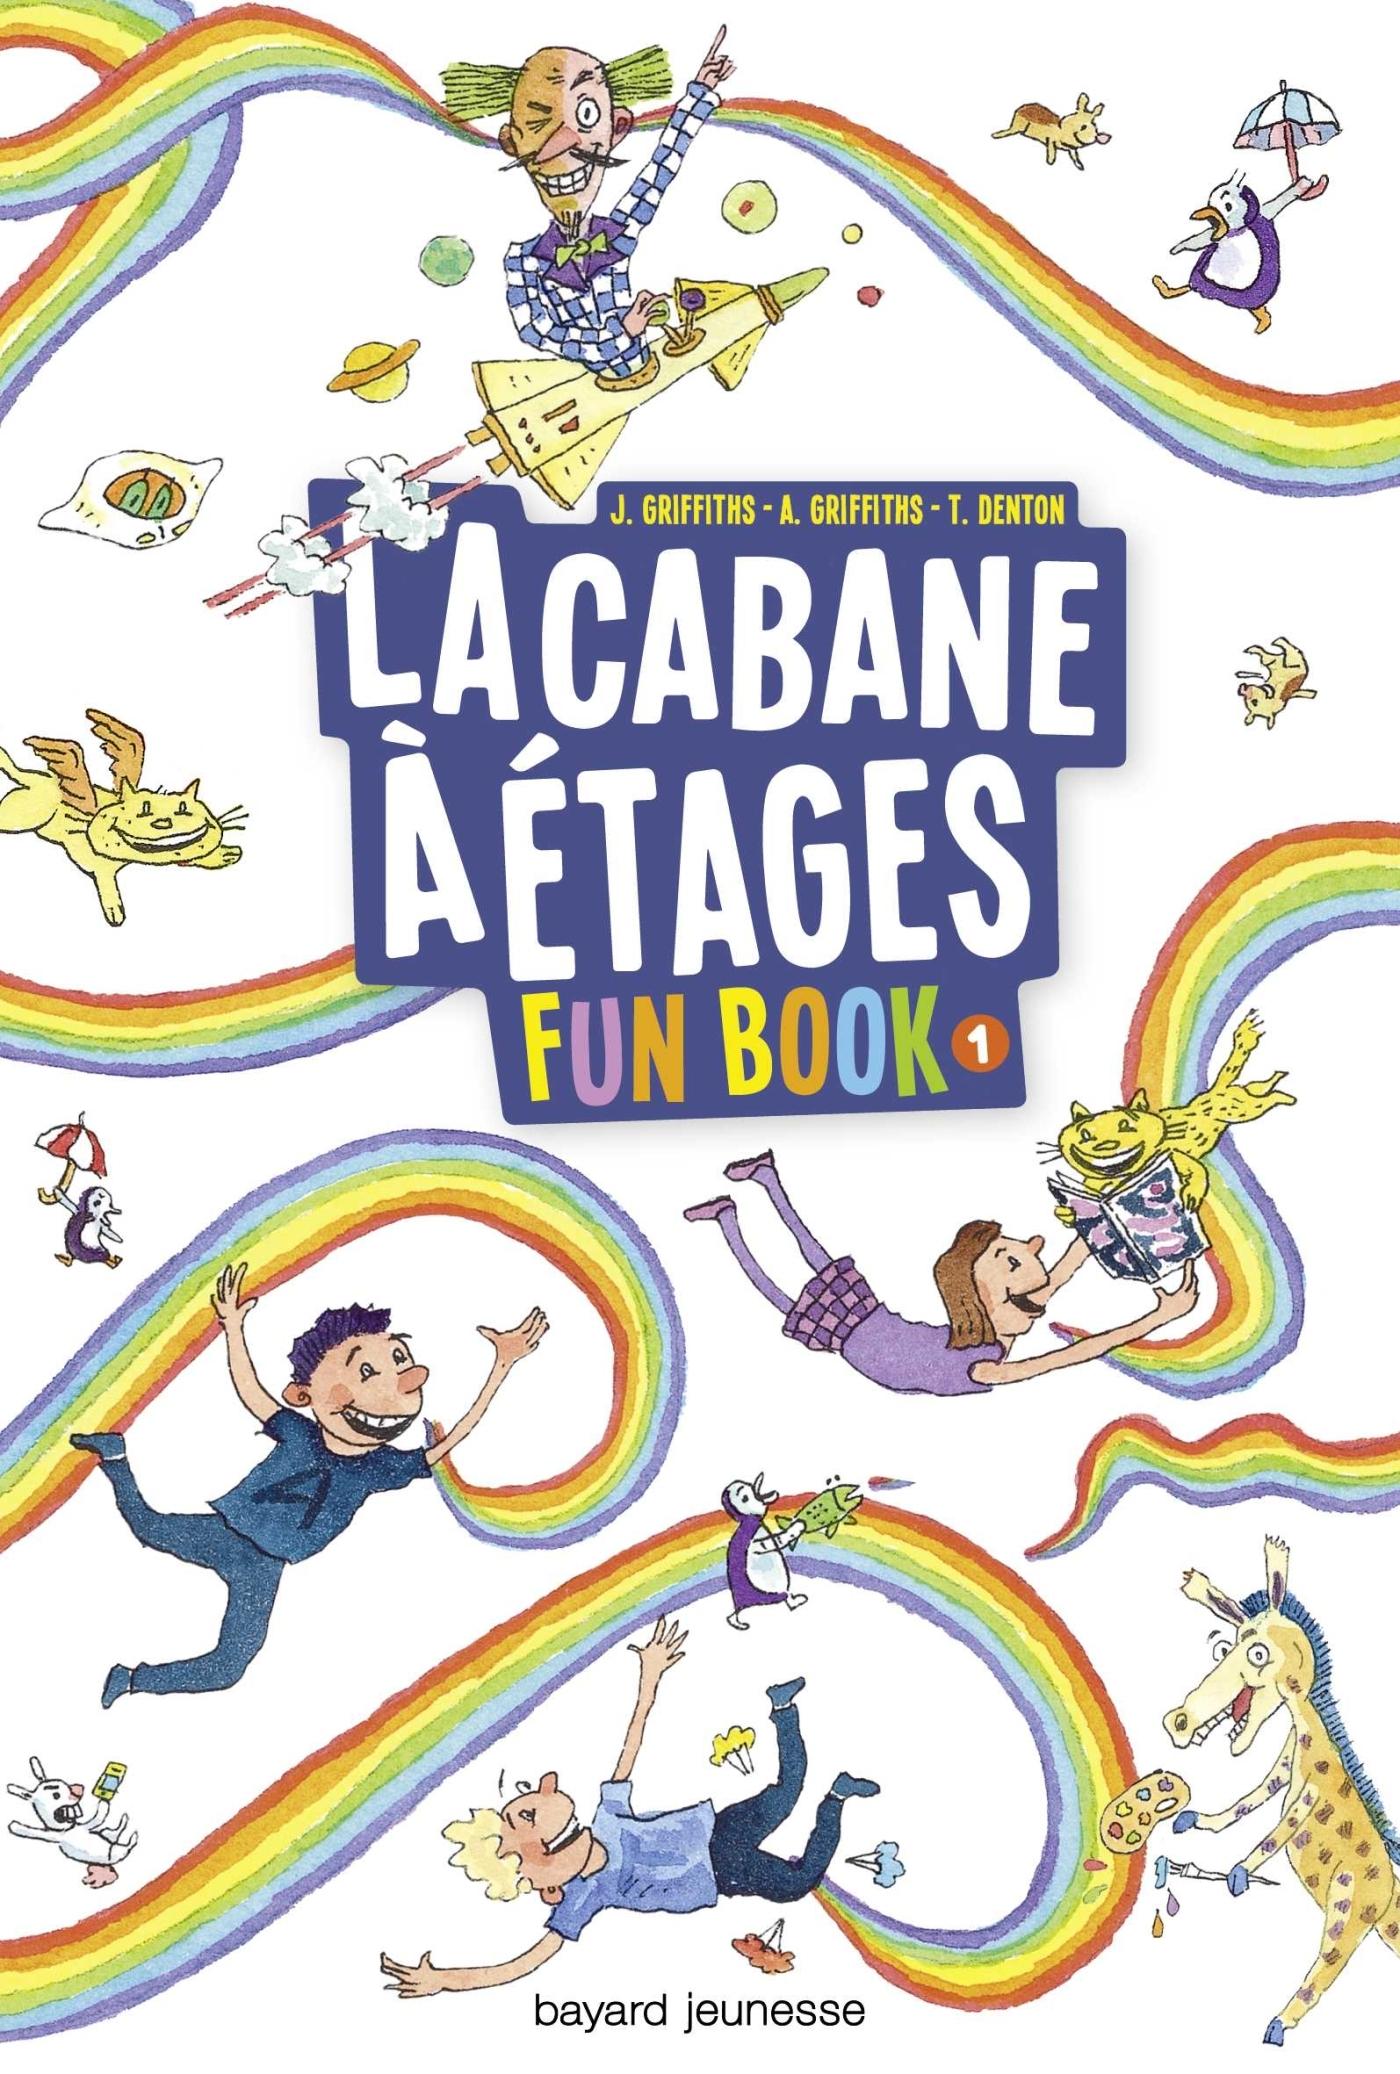 FUN BOOK, TOME 01 - LA CABANE A ETAGES LE FUN BOOK